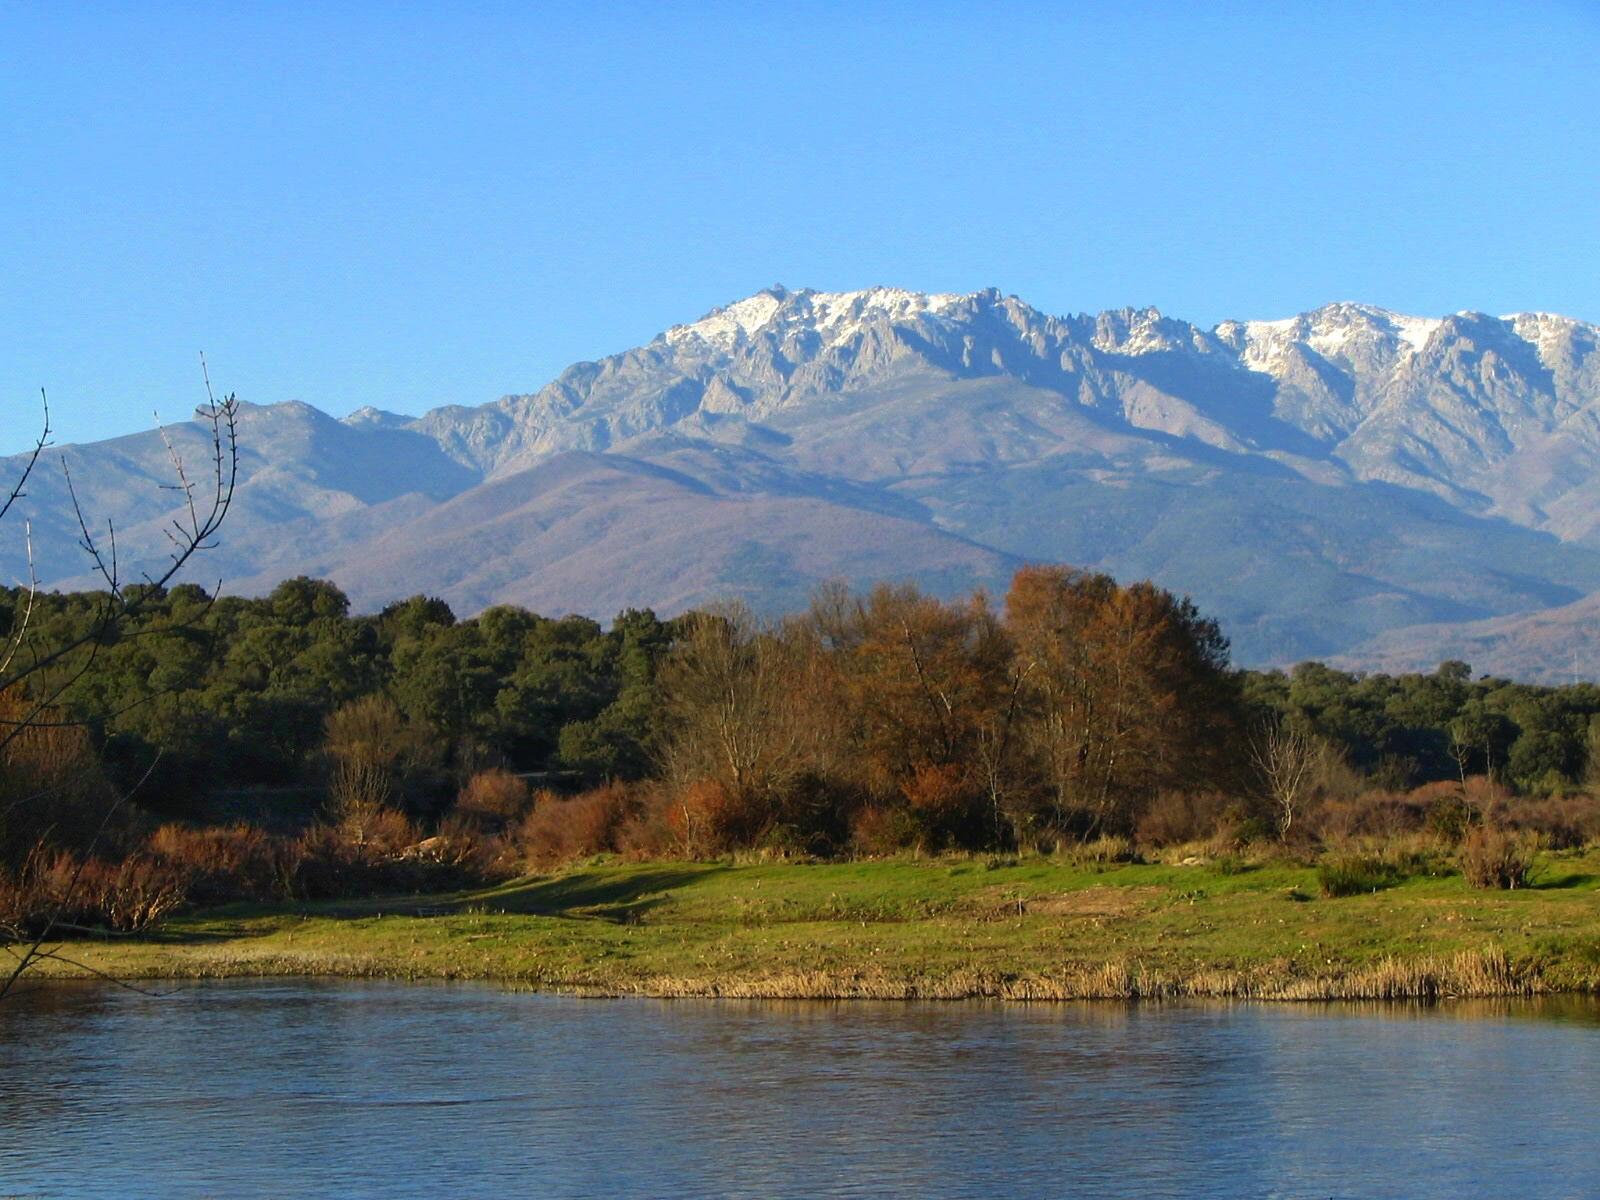 Sierra de gredos wikiwand for Piscinas naturales sierra de gredos